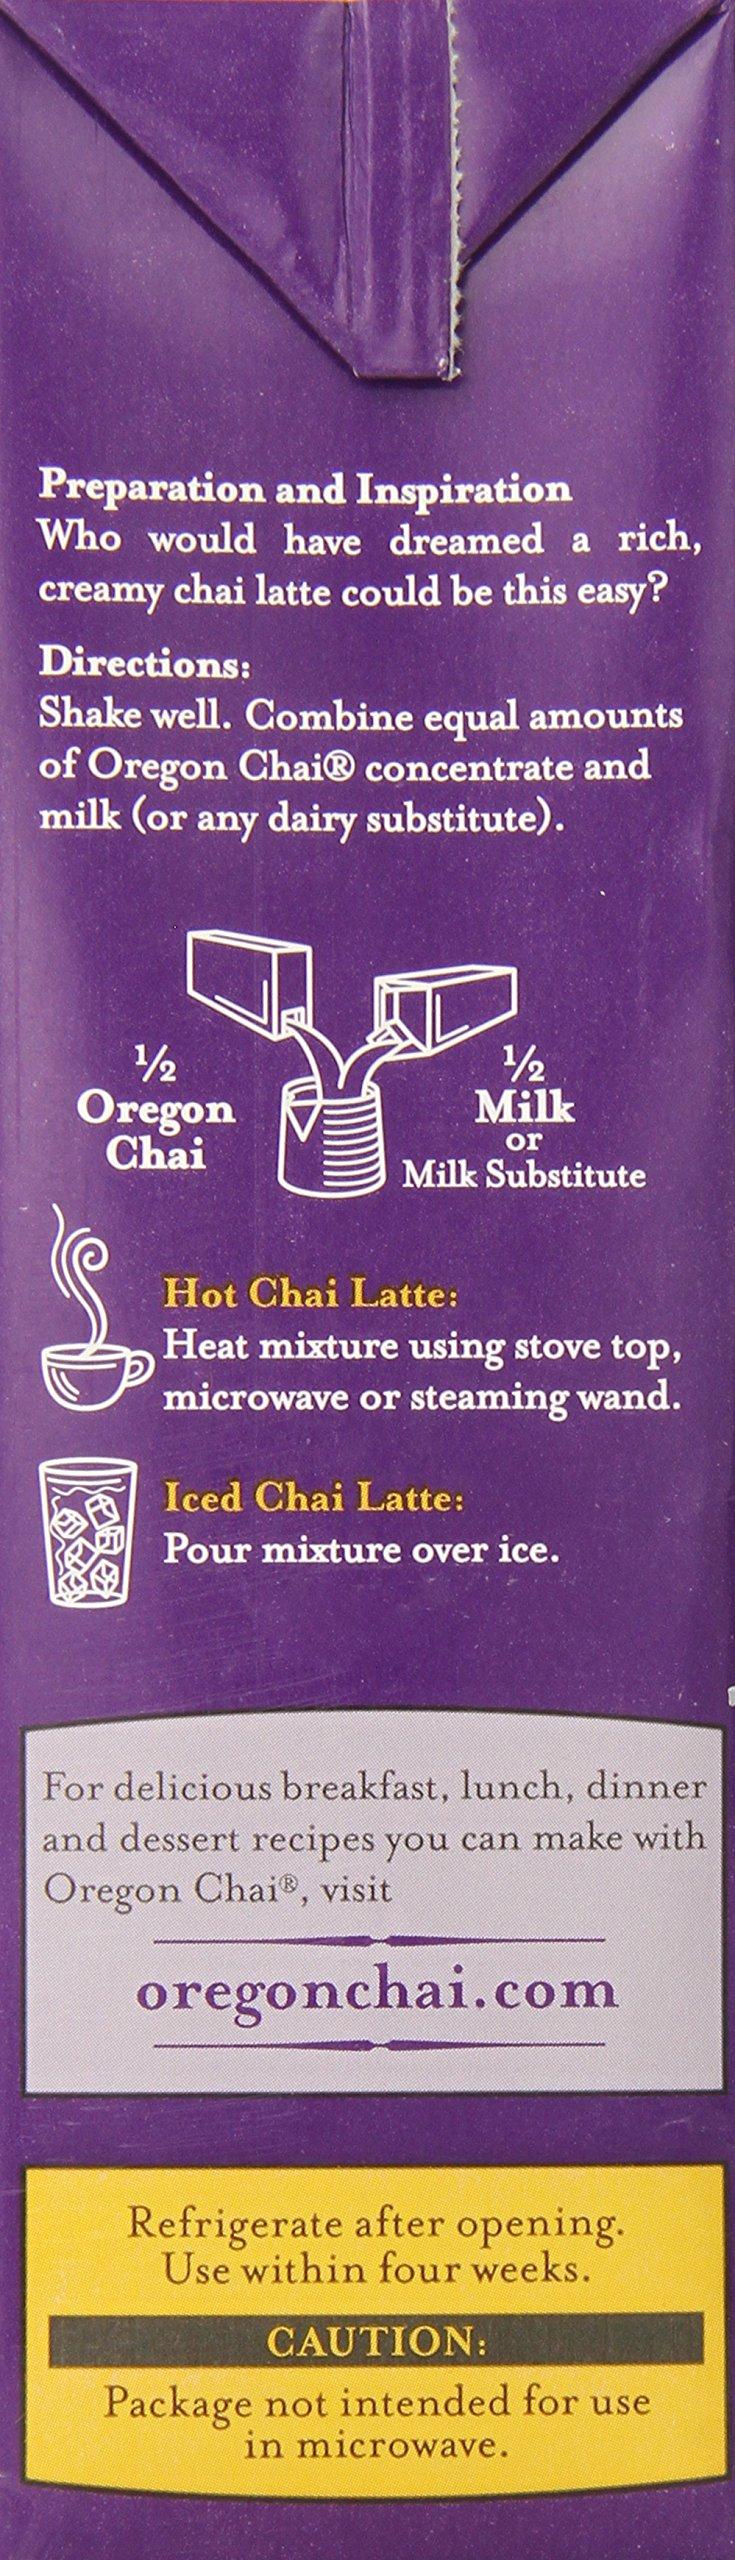 Oregon Chai Concentrate Original 32-Ounce Boxes (Pack of 6),  Liquid Chai Tea Concentrate, Spiced Black Tea For Home Use, Café, Food Service by Oregon Chai